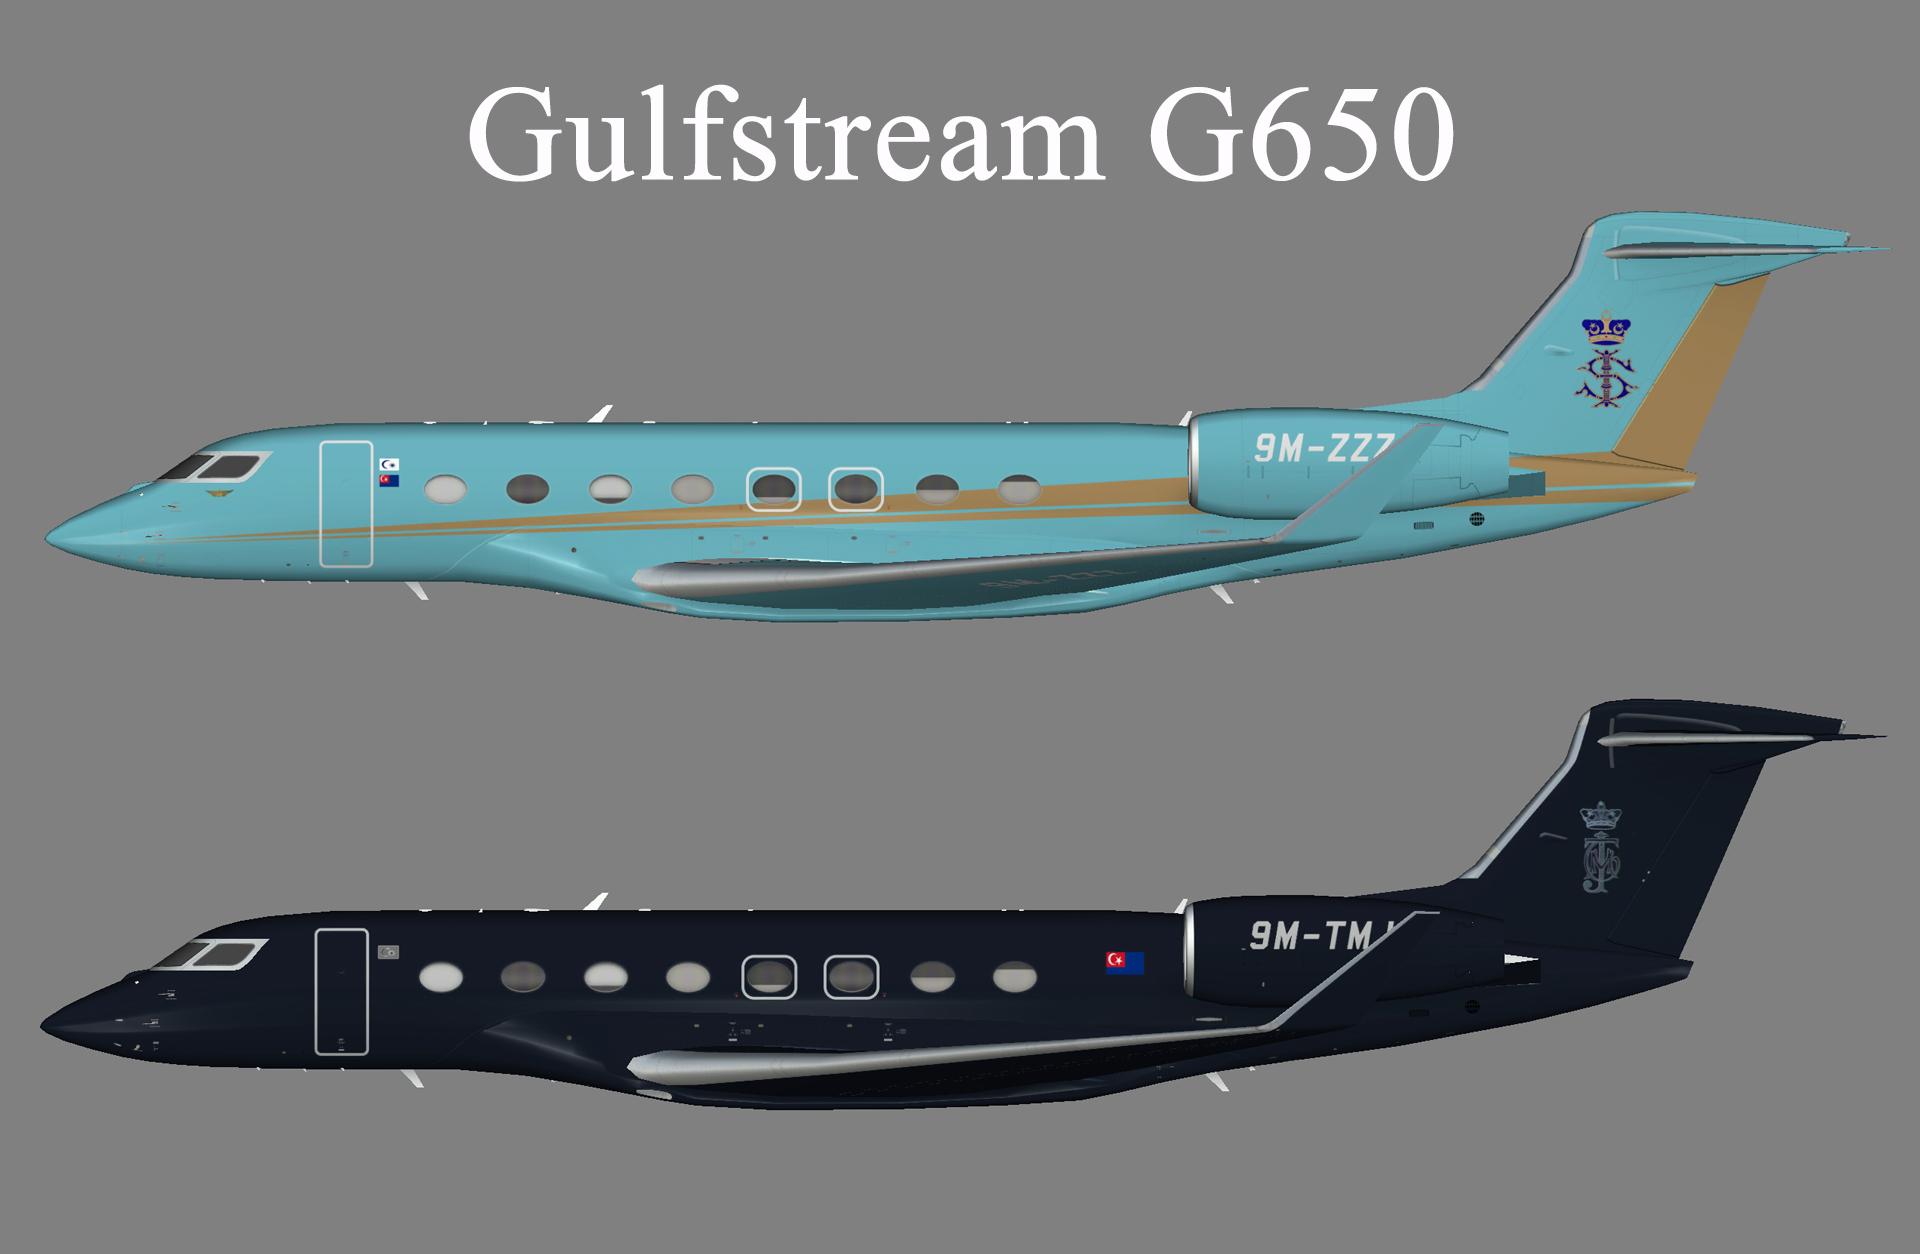 Sultan of Johor Gulfstream G650